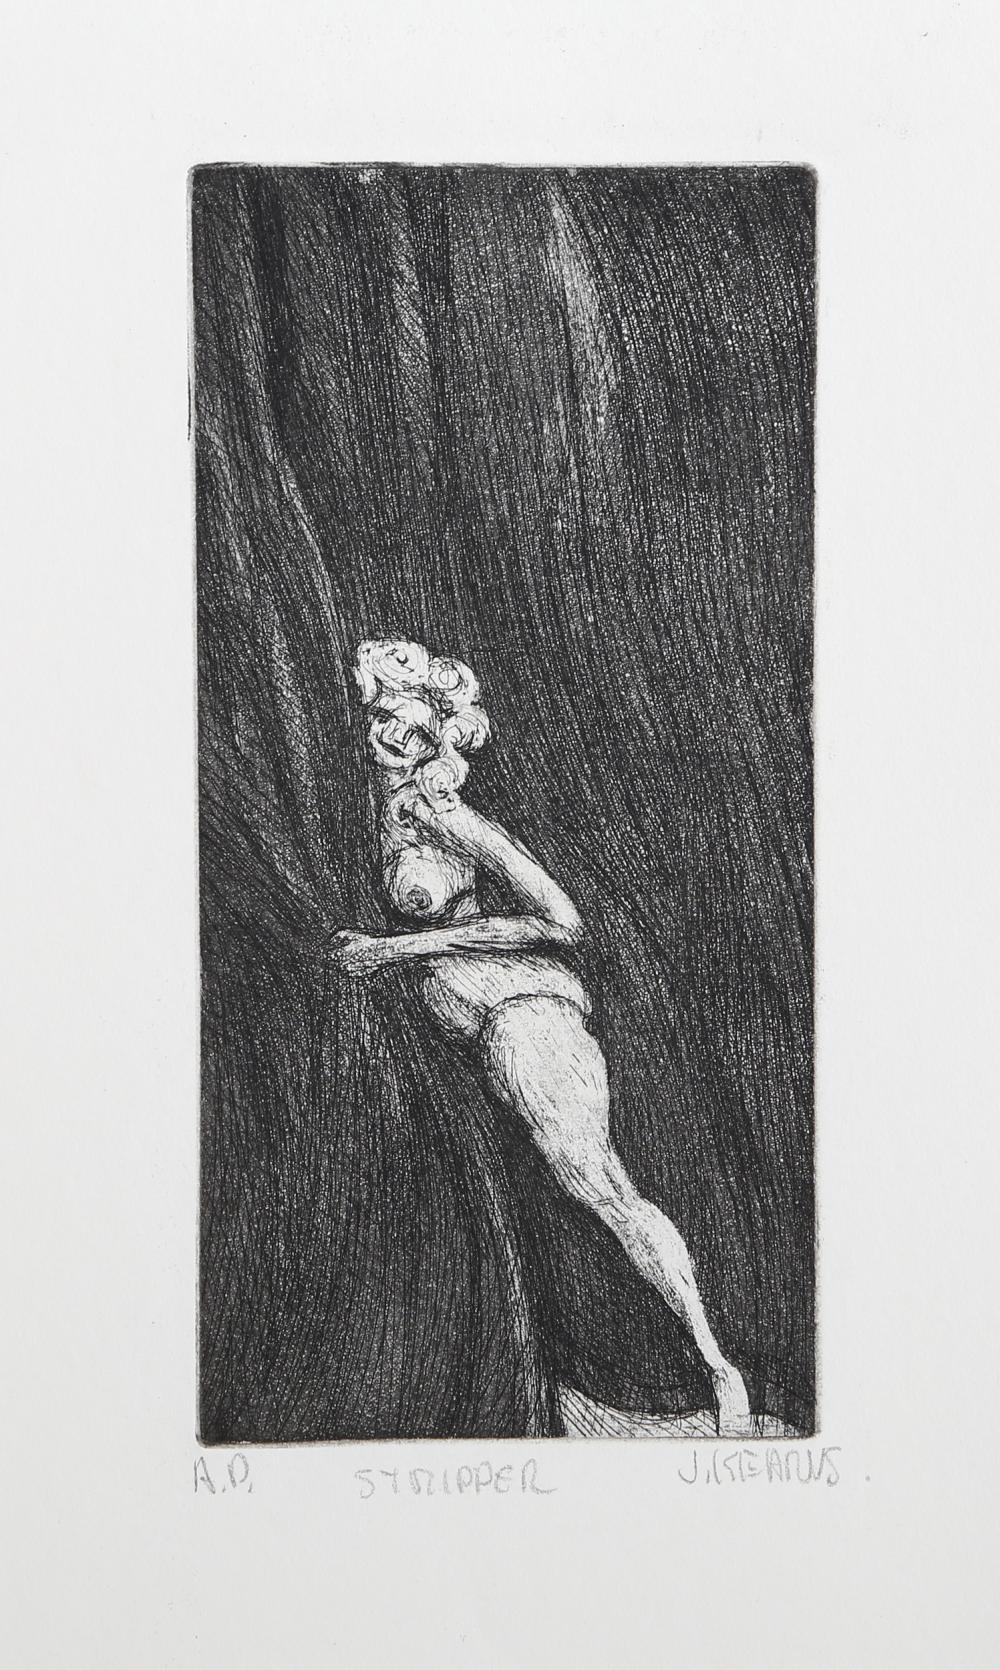 James Kearns, Stripper, Etching